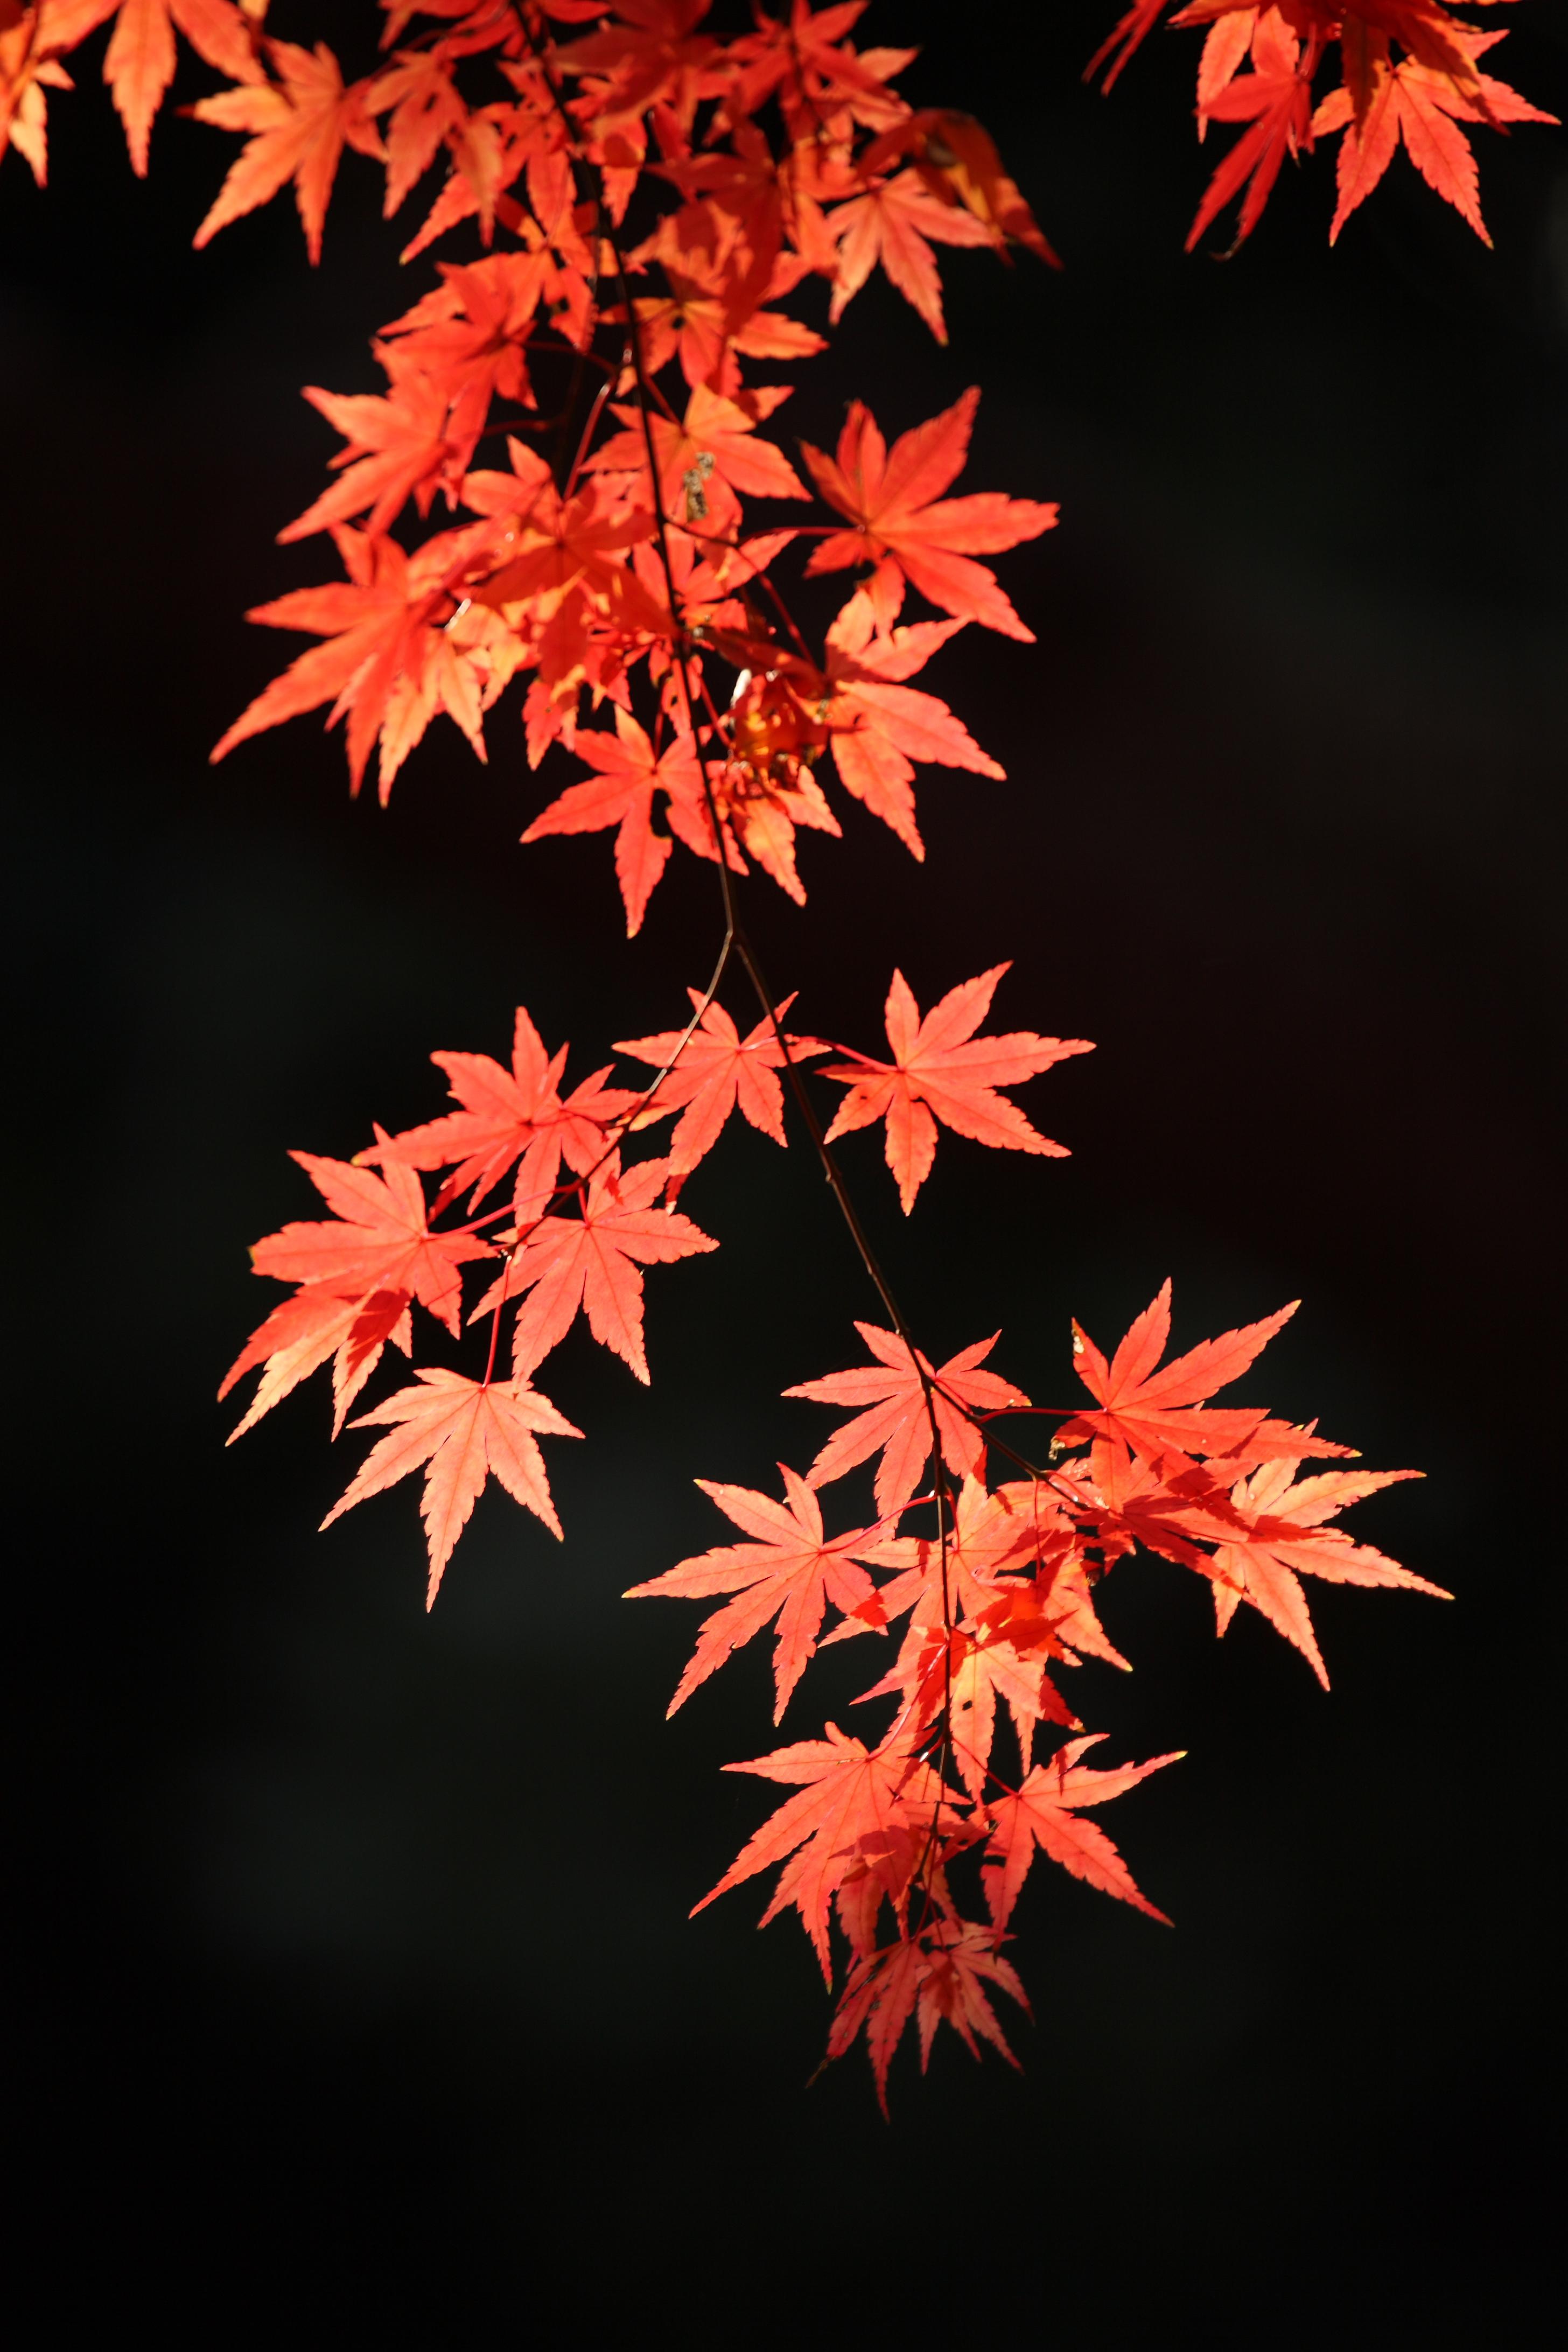 Maple Leaf Pathway Beautiful: Maple Leaves, Japanese Maple